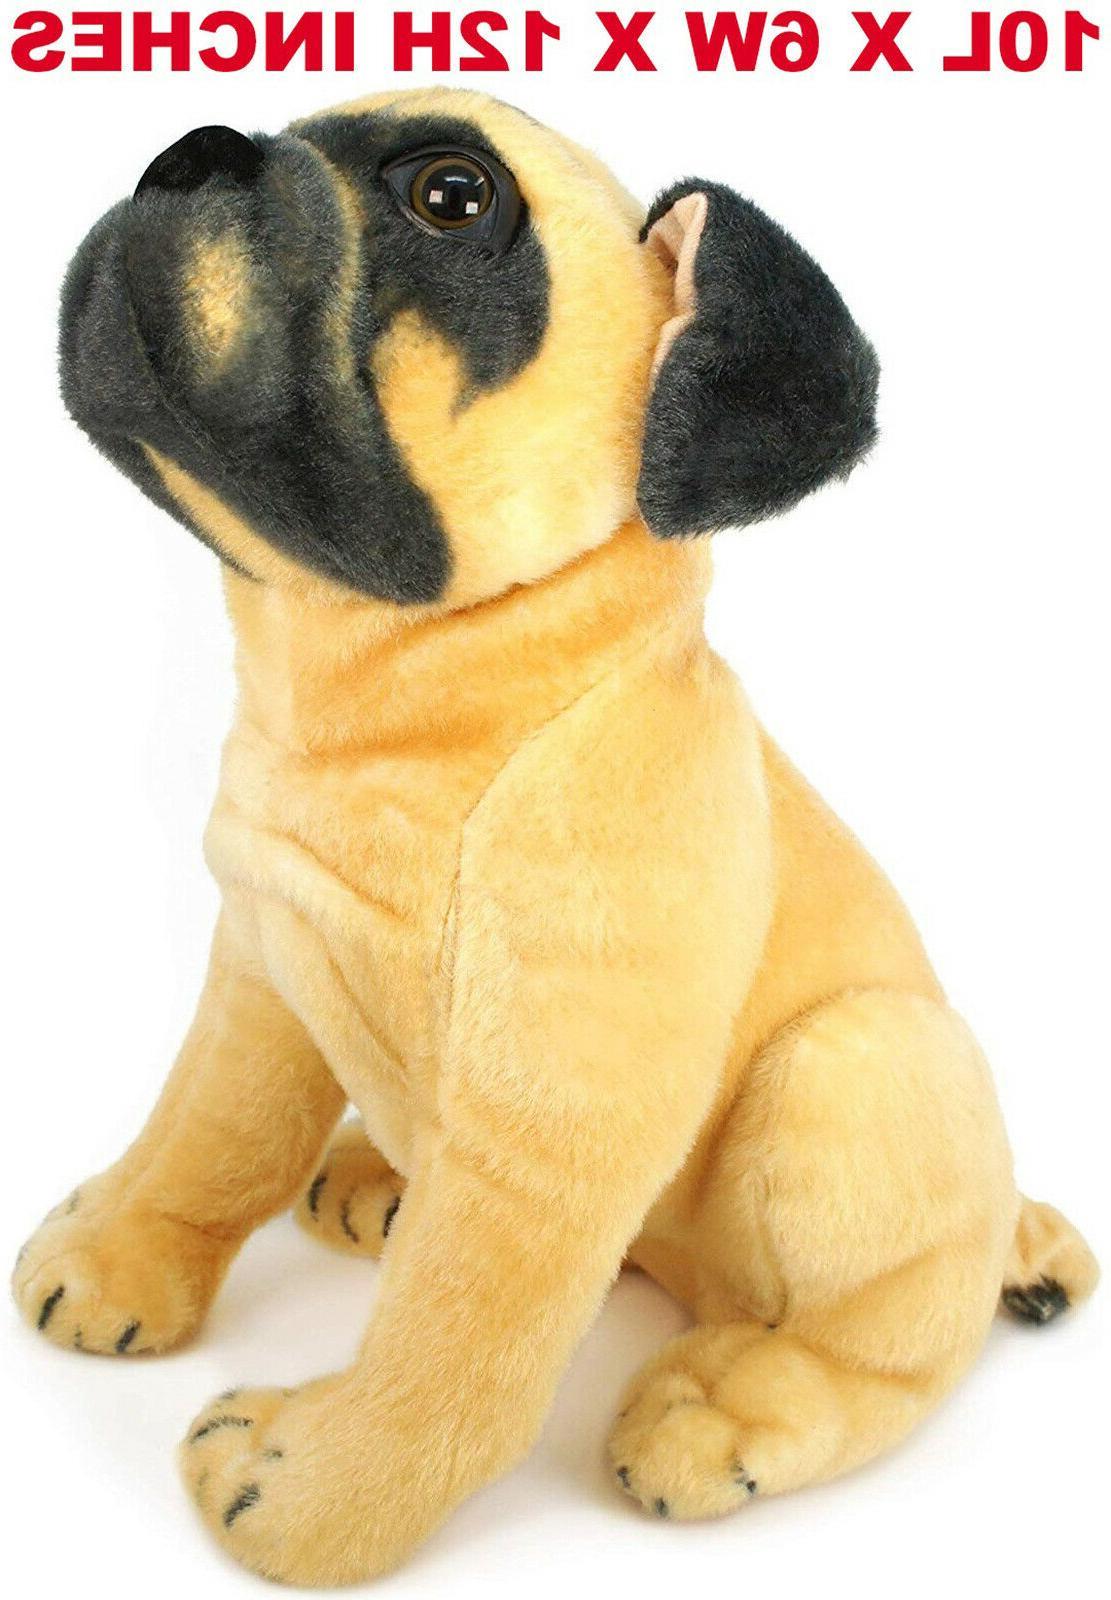 Realistic Pug Stuffed Animal, Realistic Pug Dog Pet Plush Lifelike Simulation Stuffed